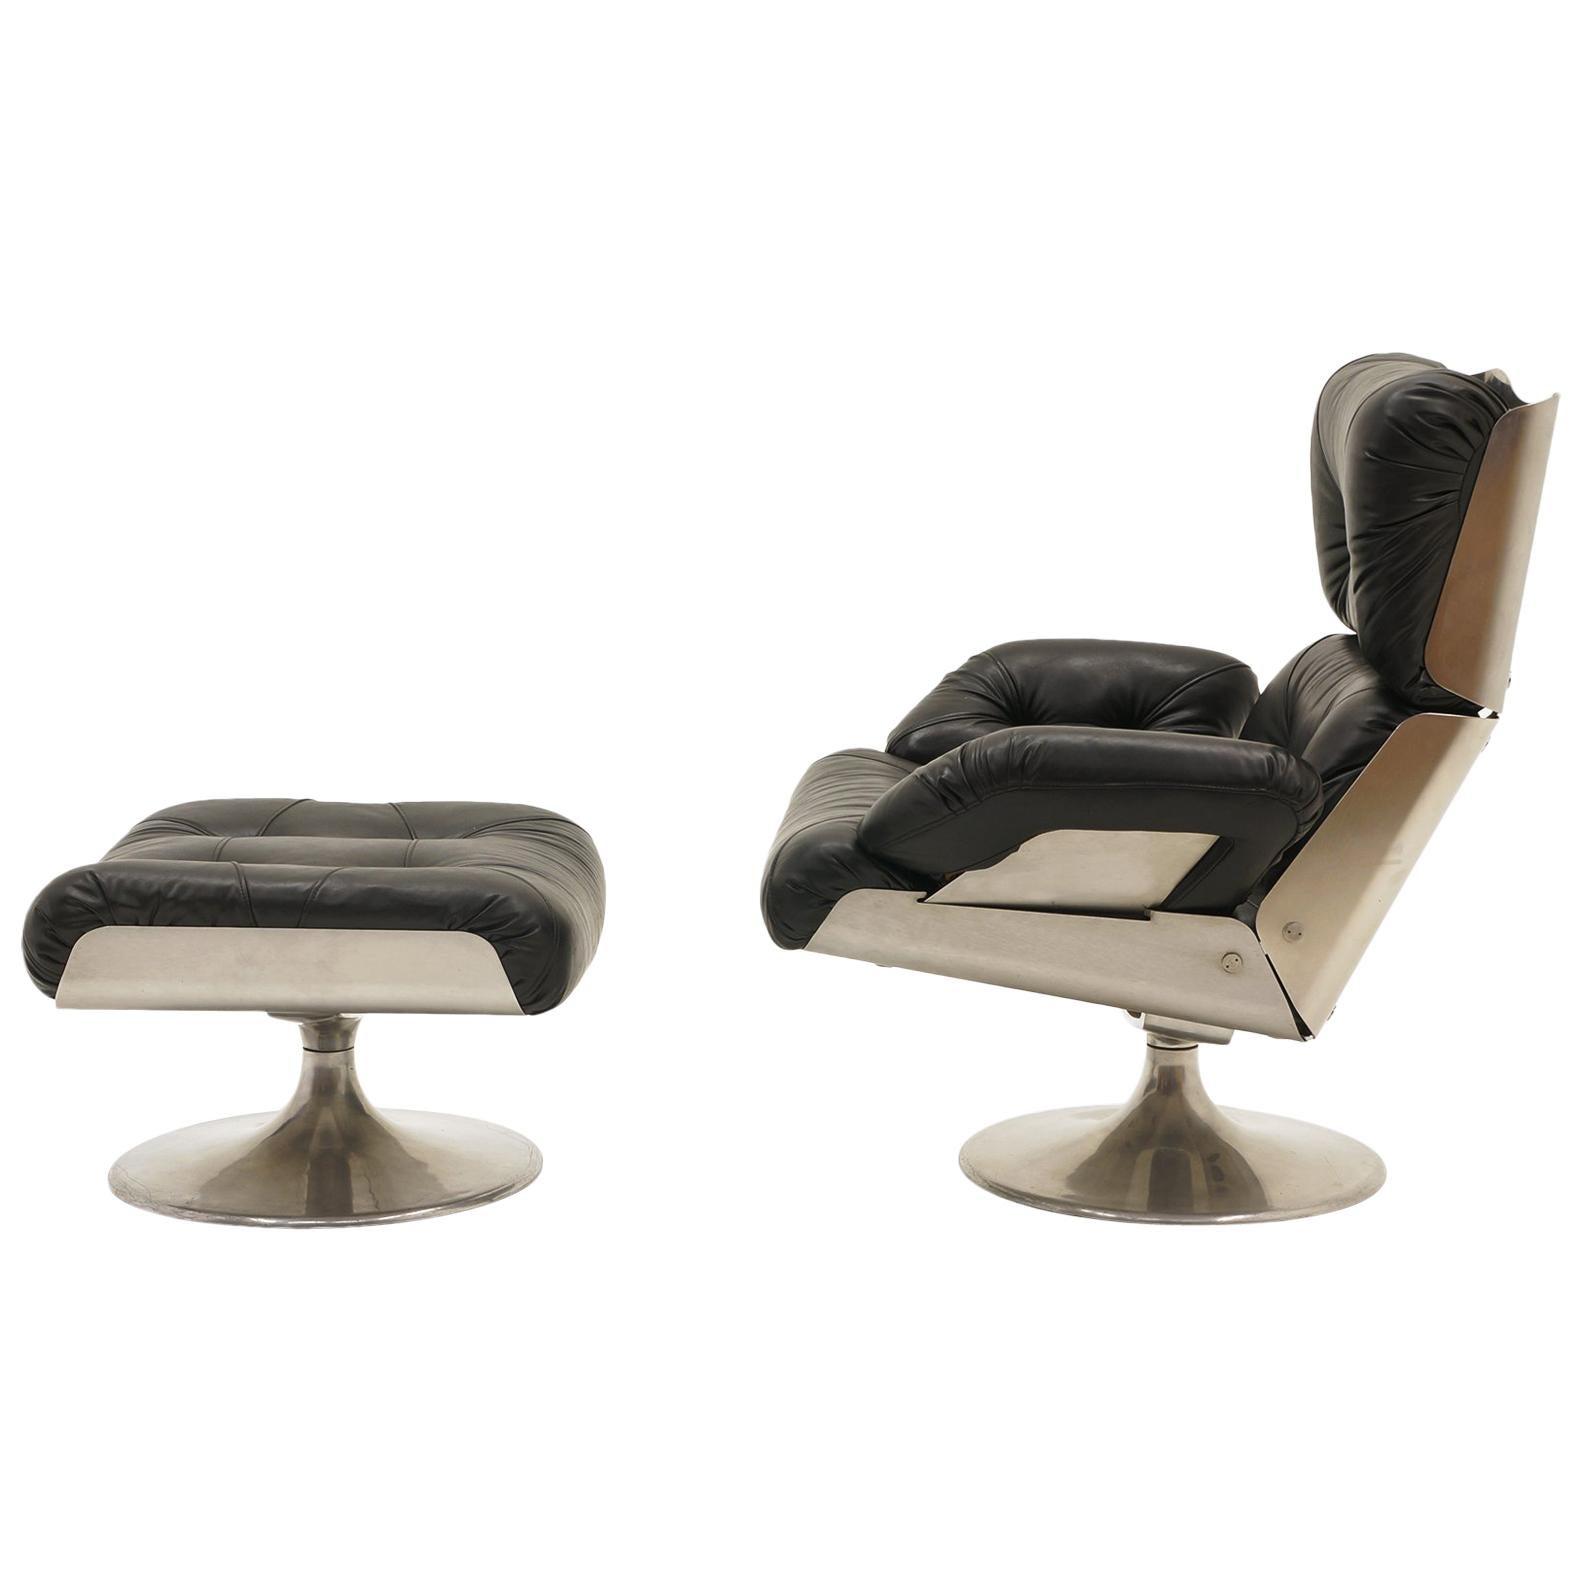 French Lounge Swivel Chair & Ottoman, Matte Chrome, Cast Aluminum, Black Vinyl